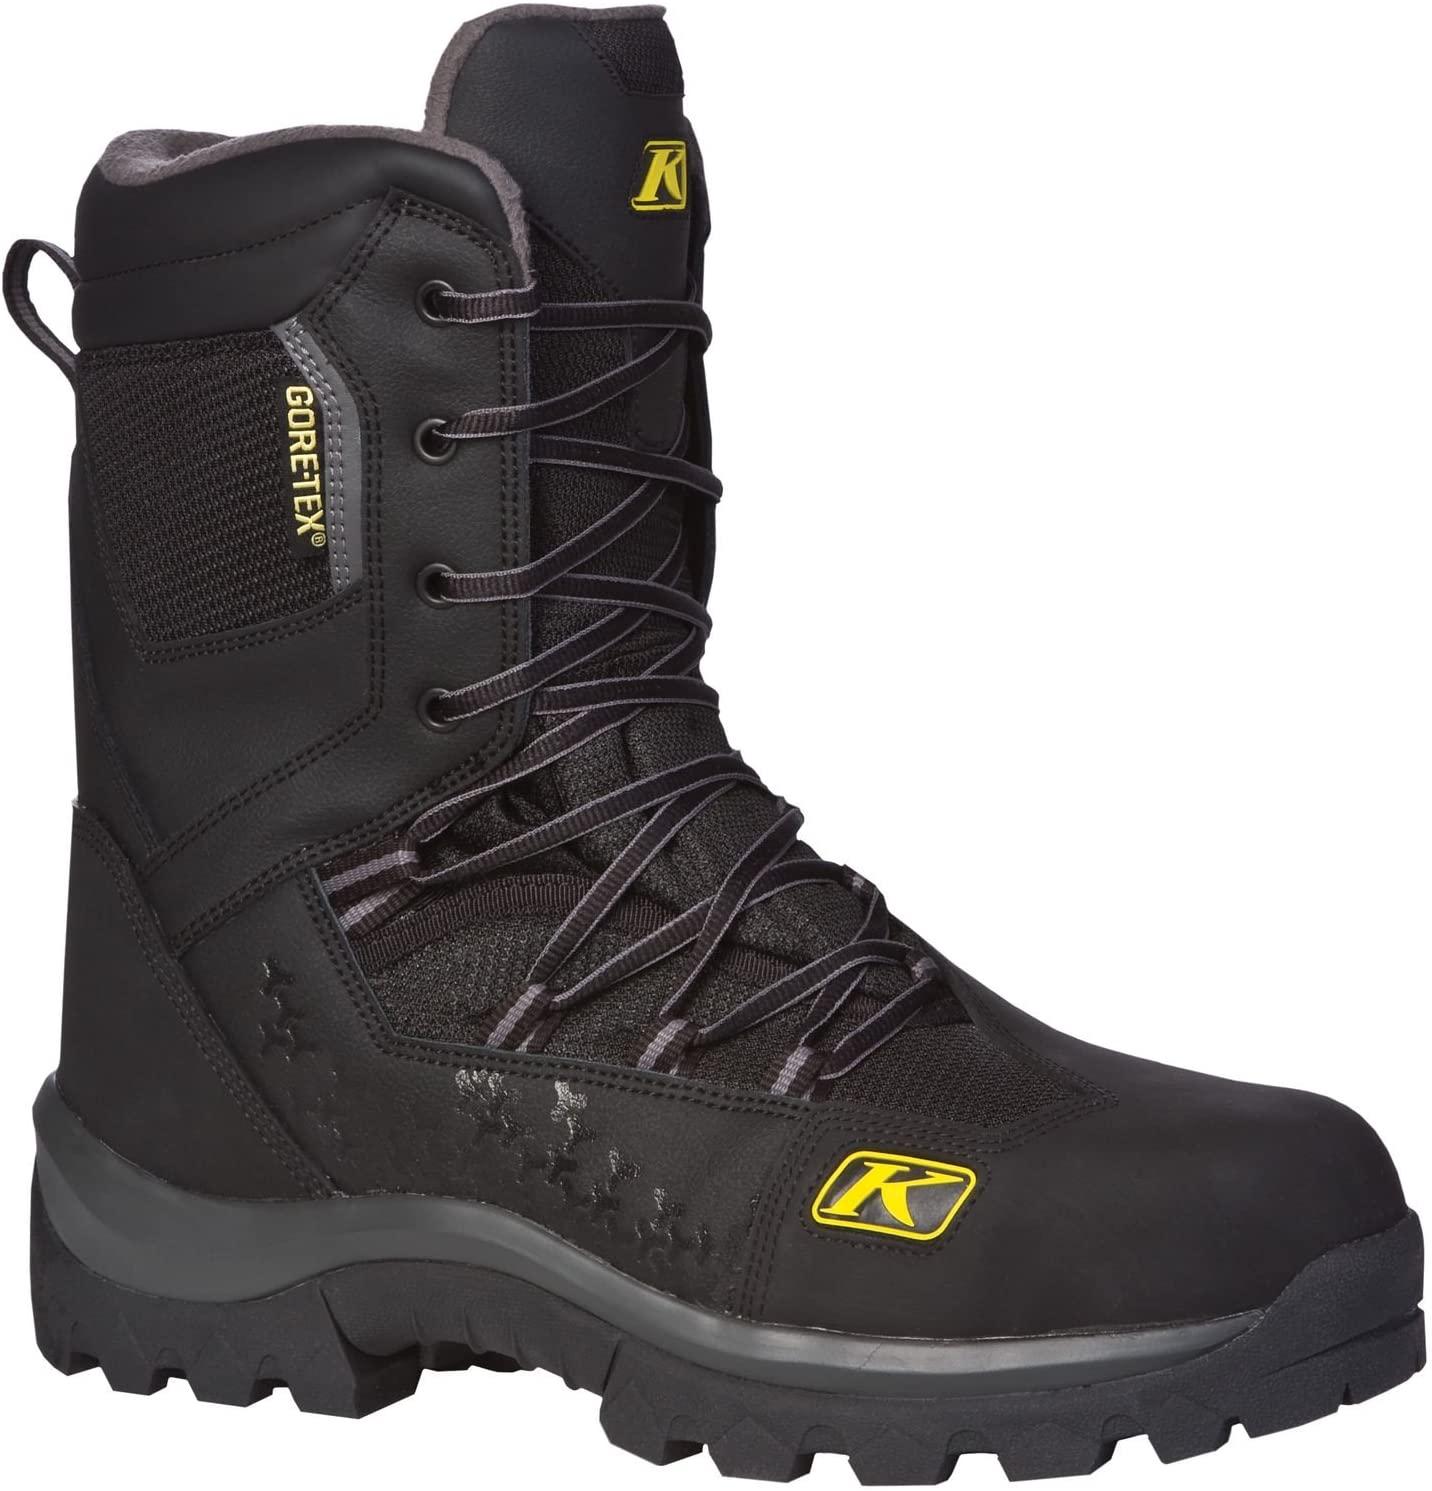 Klim Adrenaline GTX Mens Snocross Snowmobile Boots - Black/Size 5